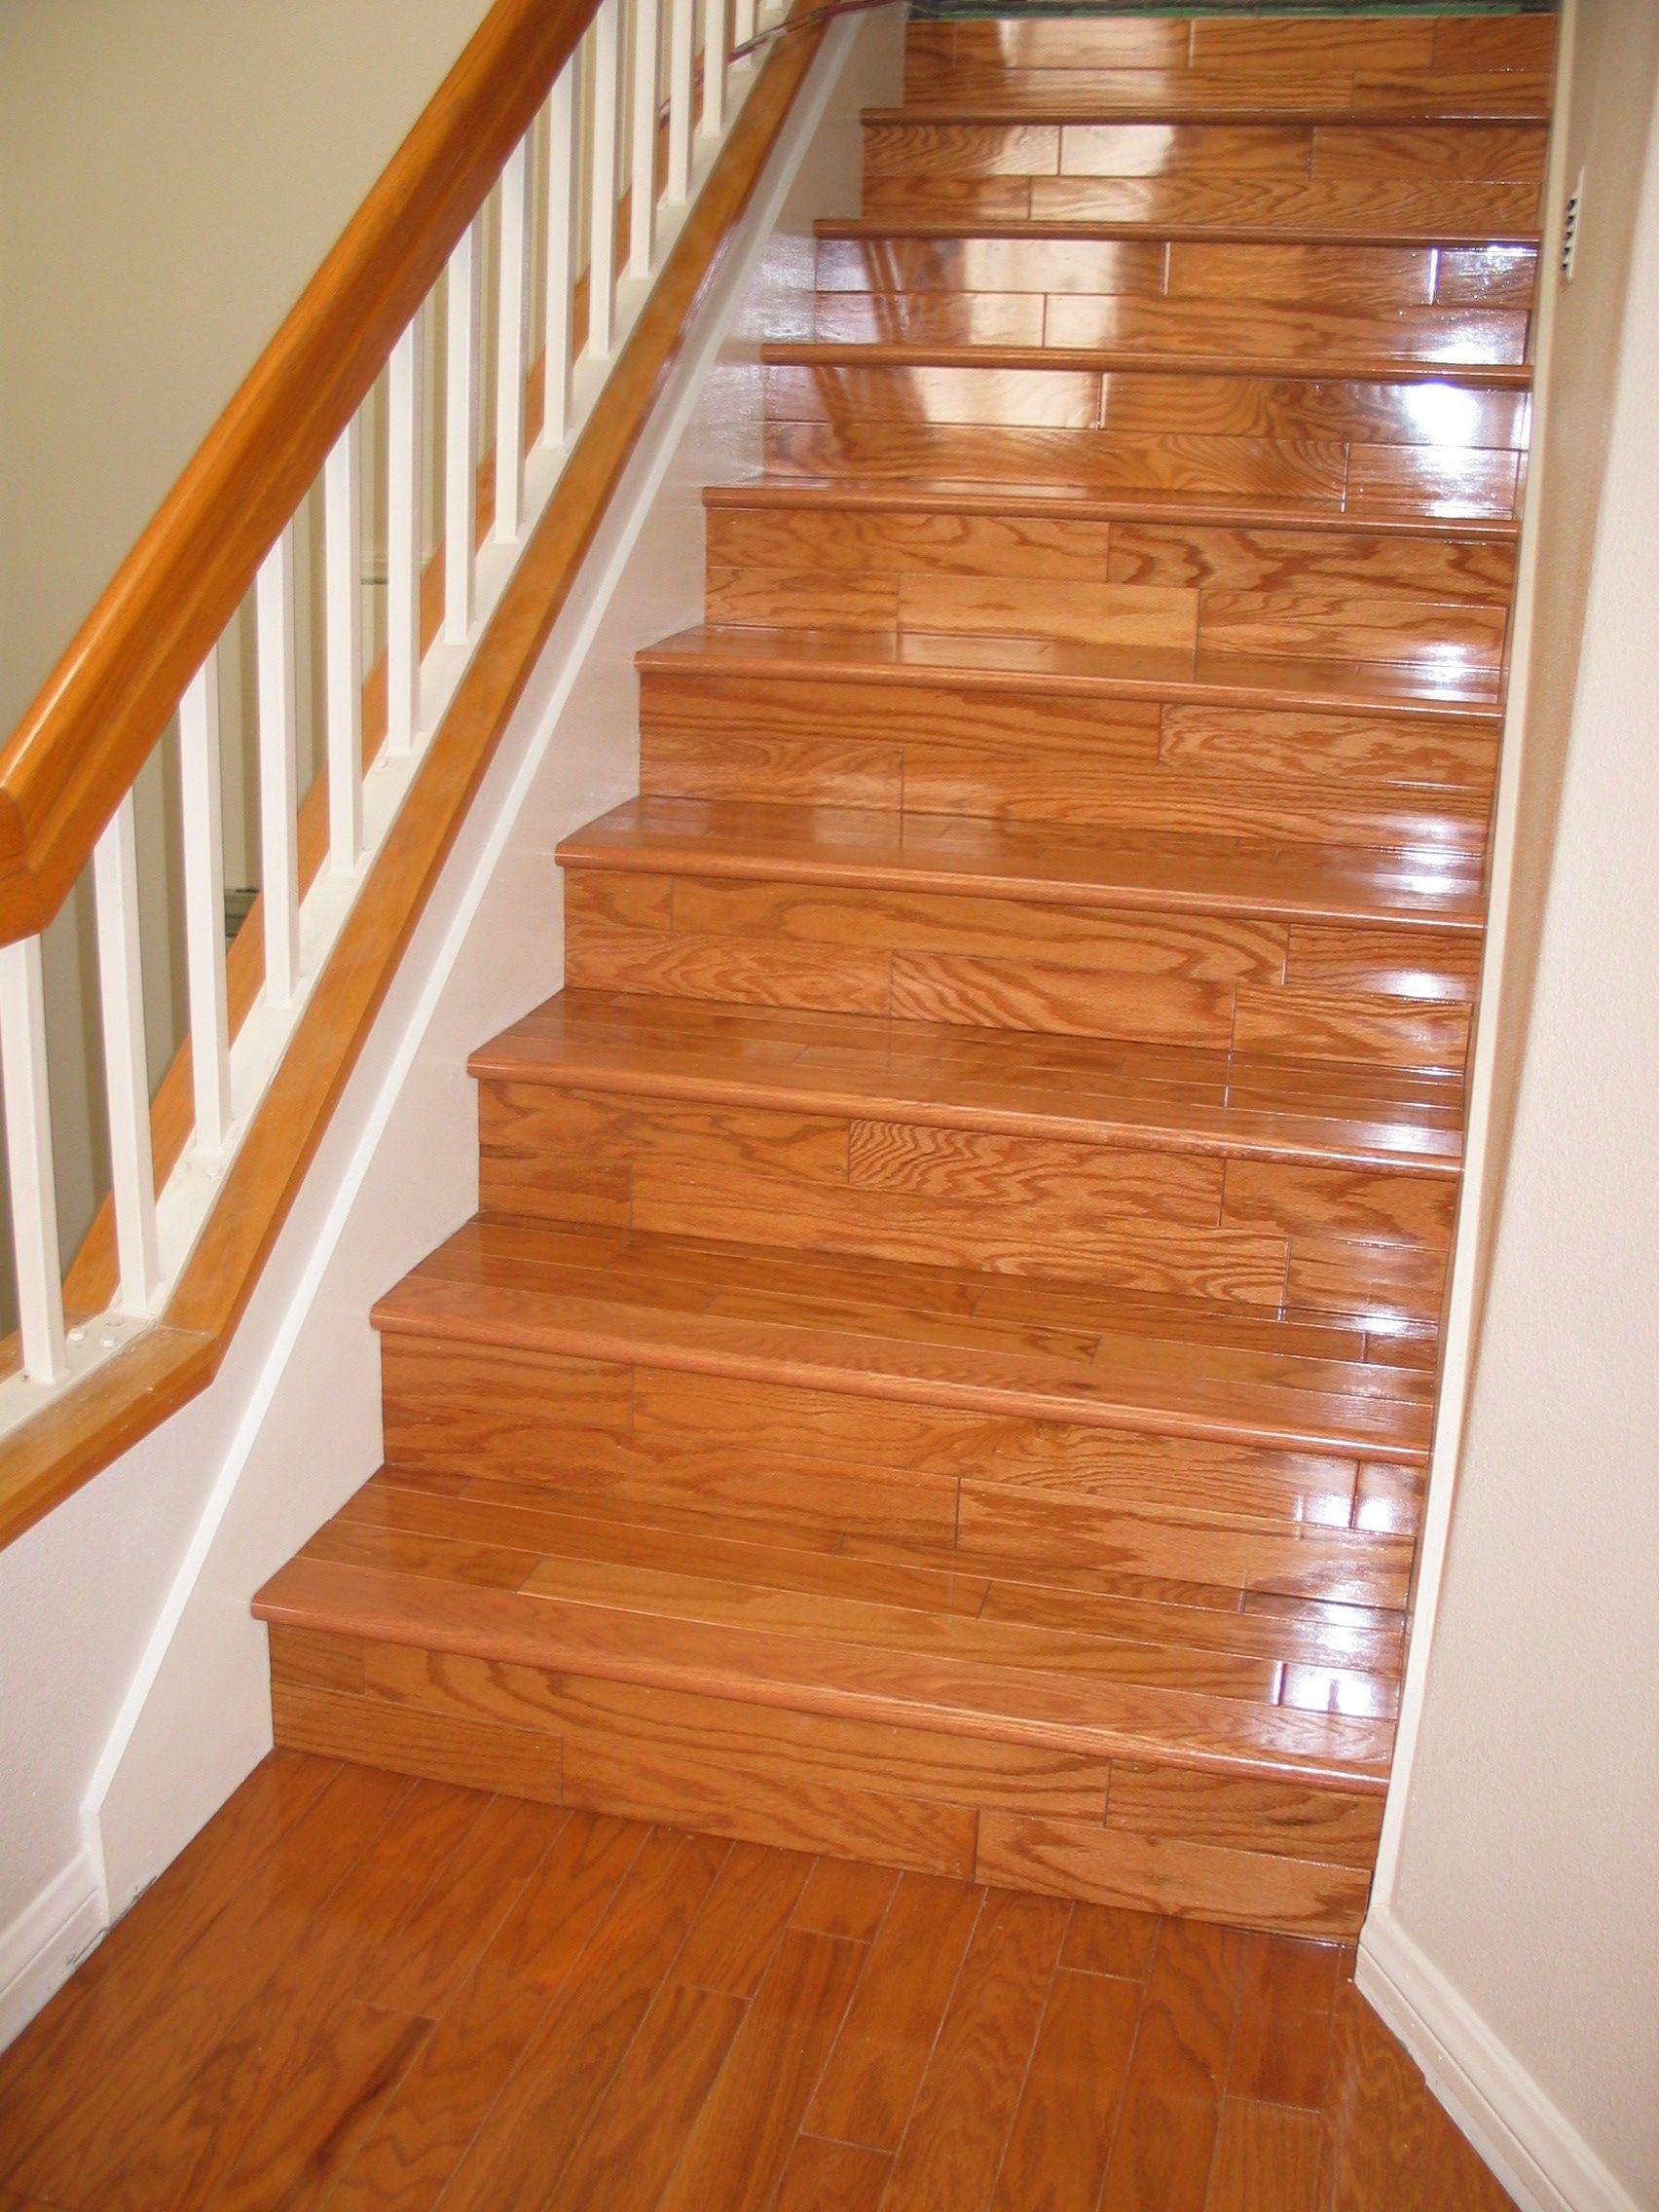 Elegant Laminated Flooring. Amazing How To Install Laminate Flooring Video: Floor  Design How To Install